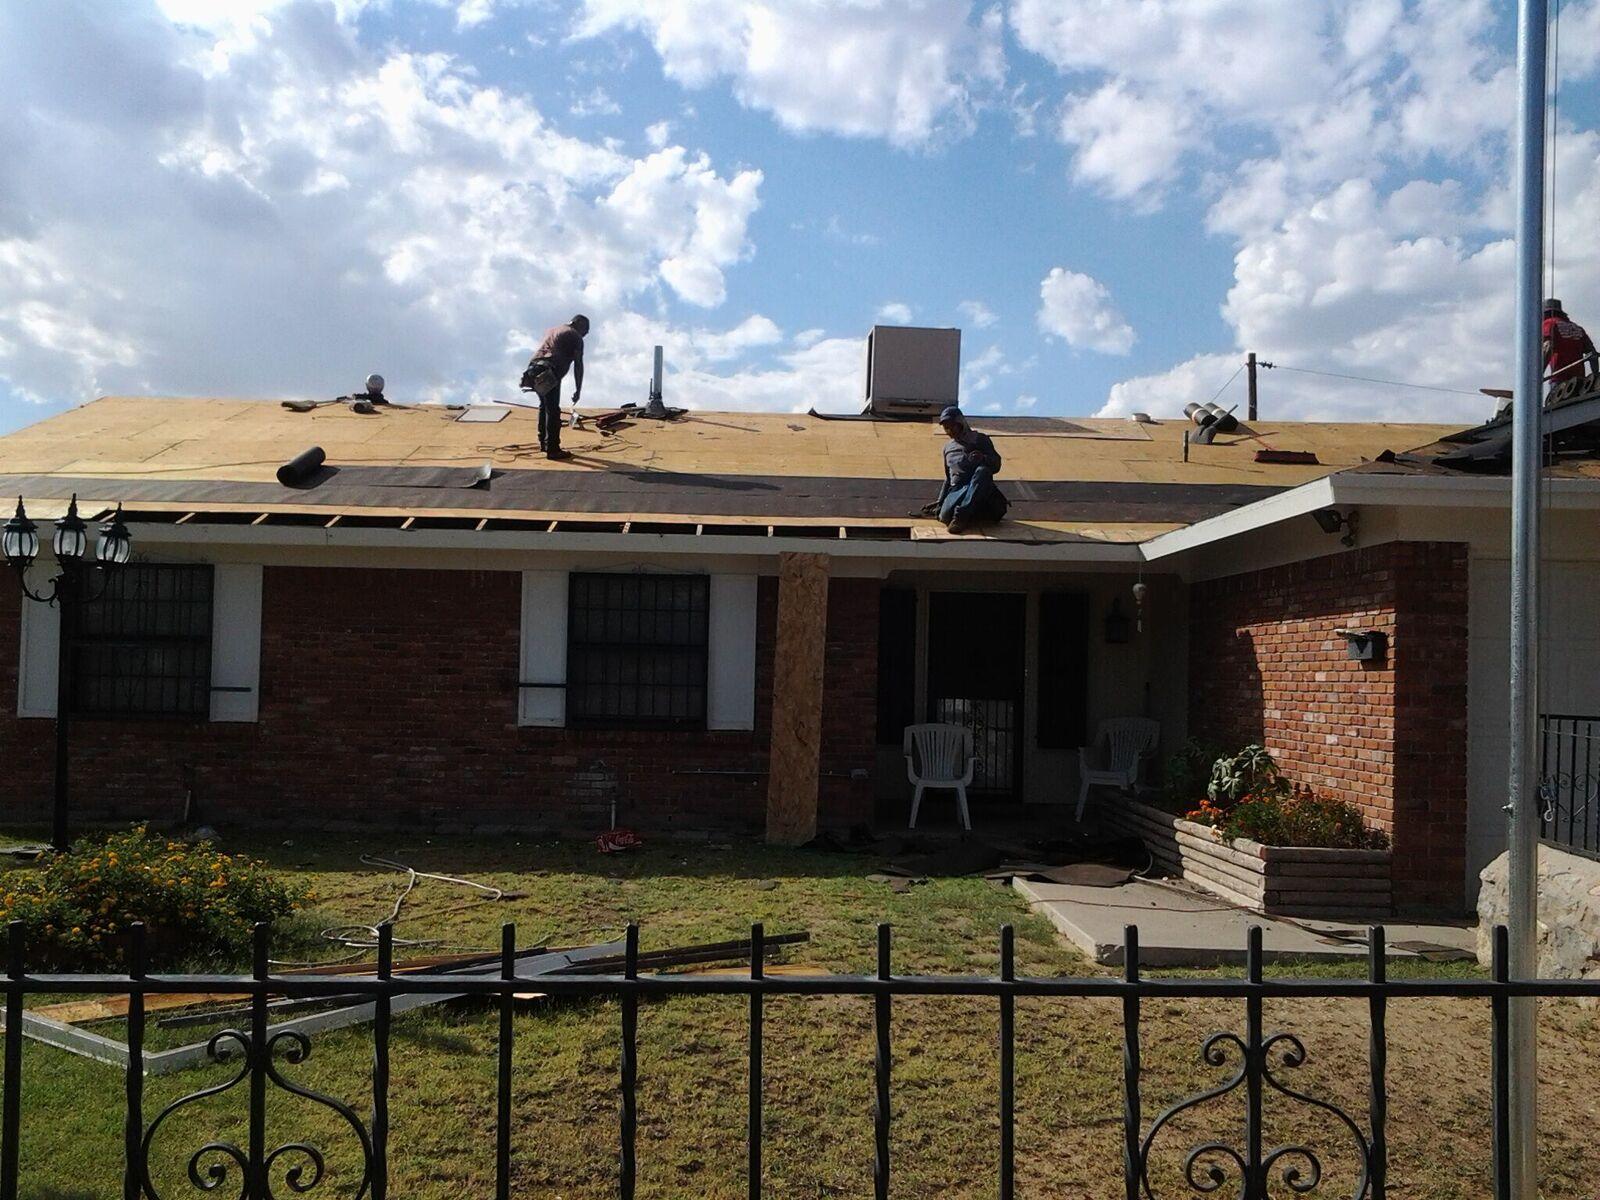 Professional Roofers & Contractors image 0